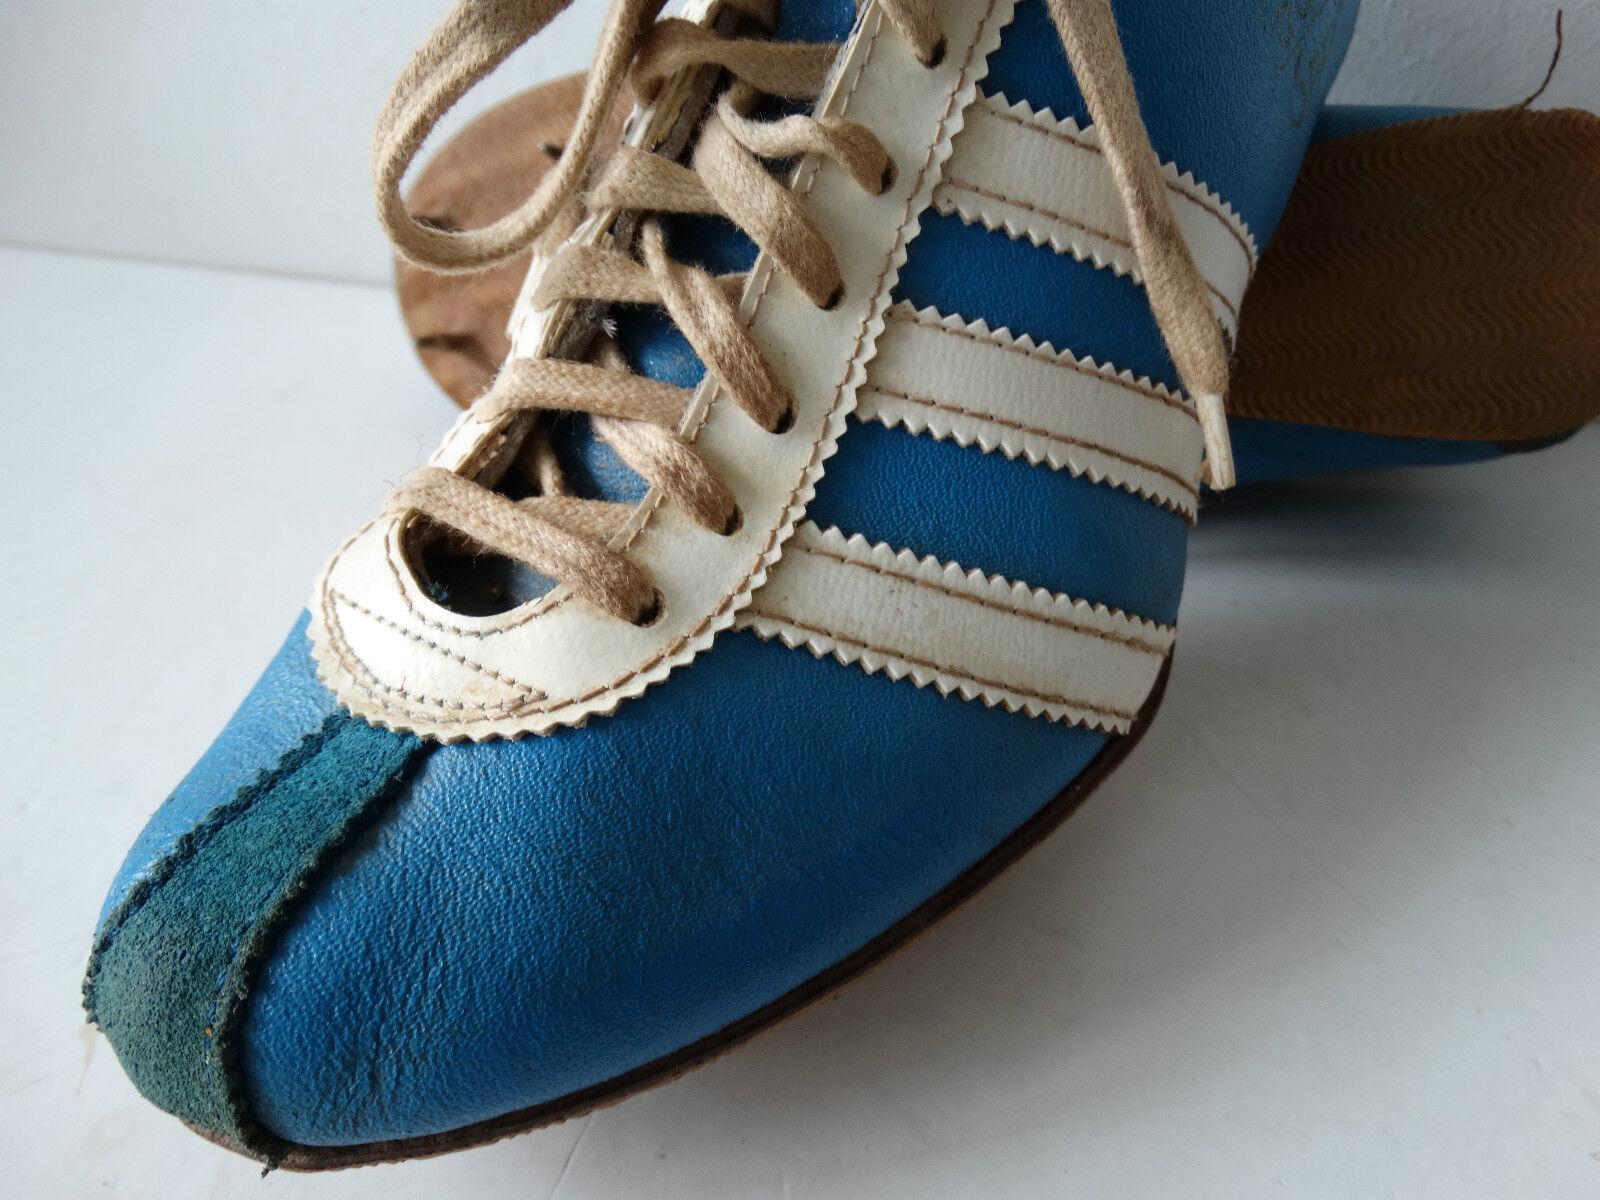 Vintage Adidas SPRINT Spikes Laufschuhe Gr 38(6) Sprinter Trainers very rare